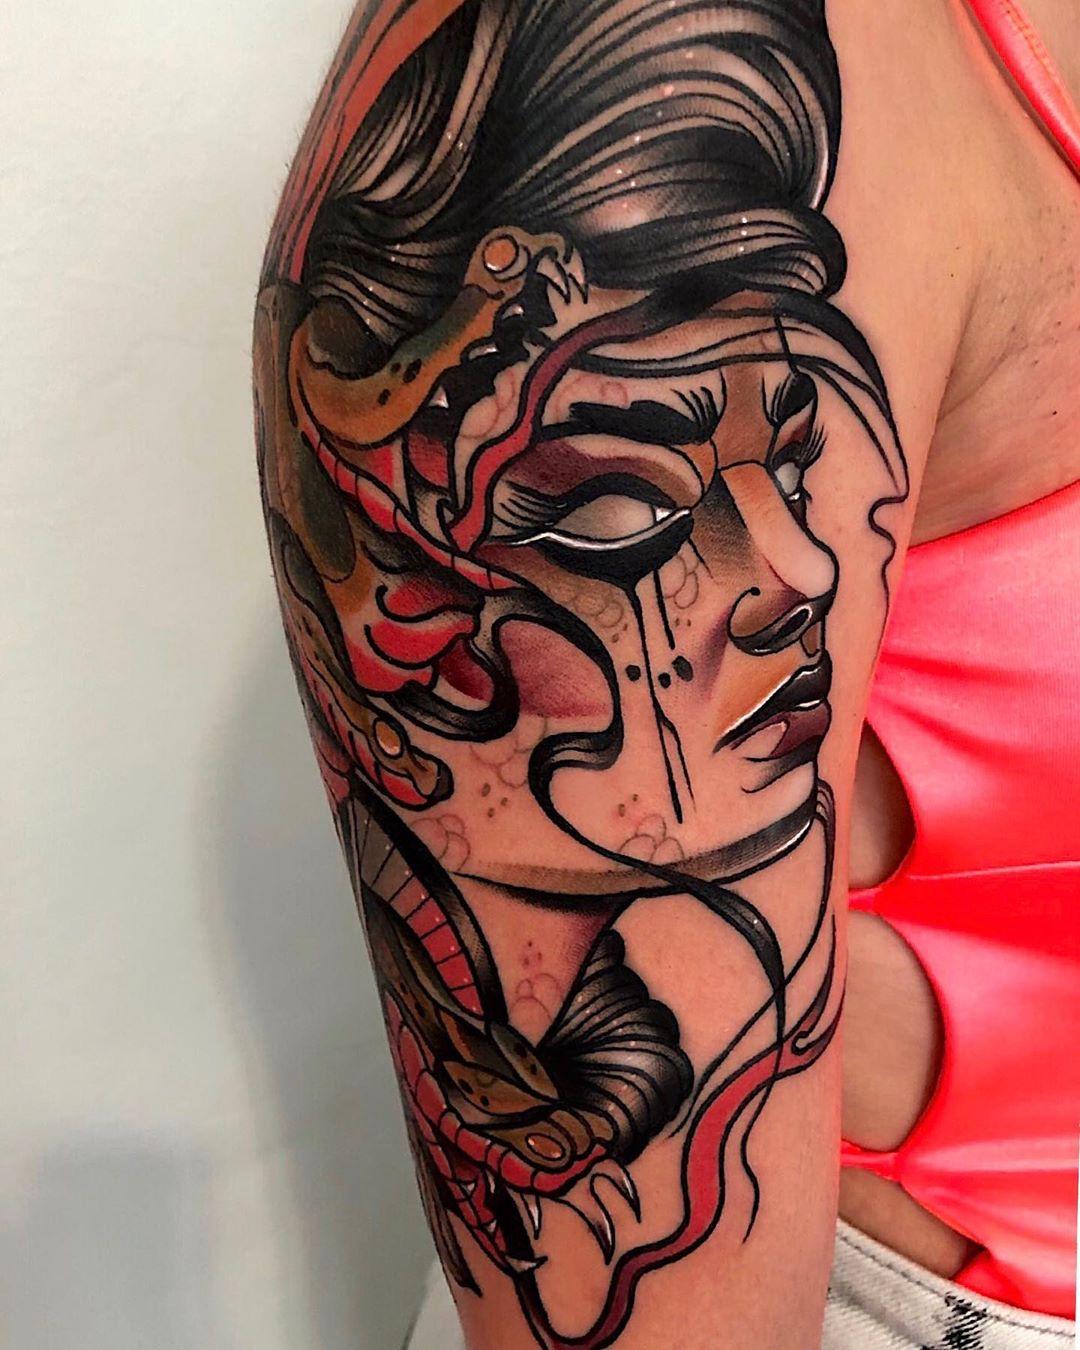 followforfollow,berlin,followmeciudadreal,ciudadreal,tomelloso,almagro,puertollano,tatuajesenpuertollano,tatuajesendaimiel,ciudadrealtattoo,ciudadrealtatuajes,tatuajesciudadreal,follow,ciudadrealtatuajes,puertollano,tattooers,besttattooers,juantabasco,ciudadrealsetatua,ink,tatuajes,realismo,realistictattoo,ciudadrealtattoo,tatuajesenpuertollano,traditionaltattoos,castillalamancha,ink,tattooart,zurichtattoo,daimiel,inkedgirls,inkig,ink,inktattoos